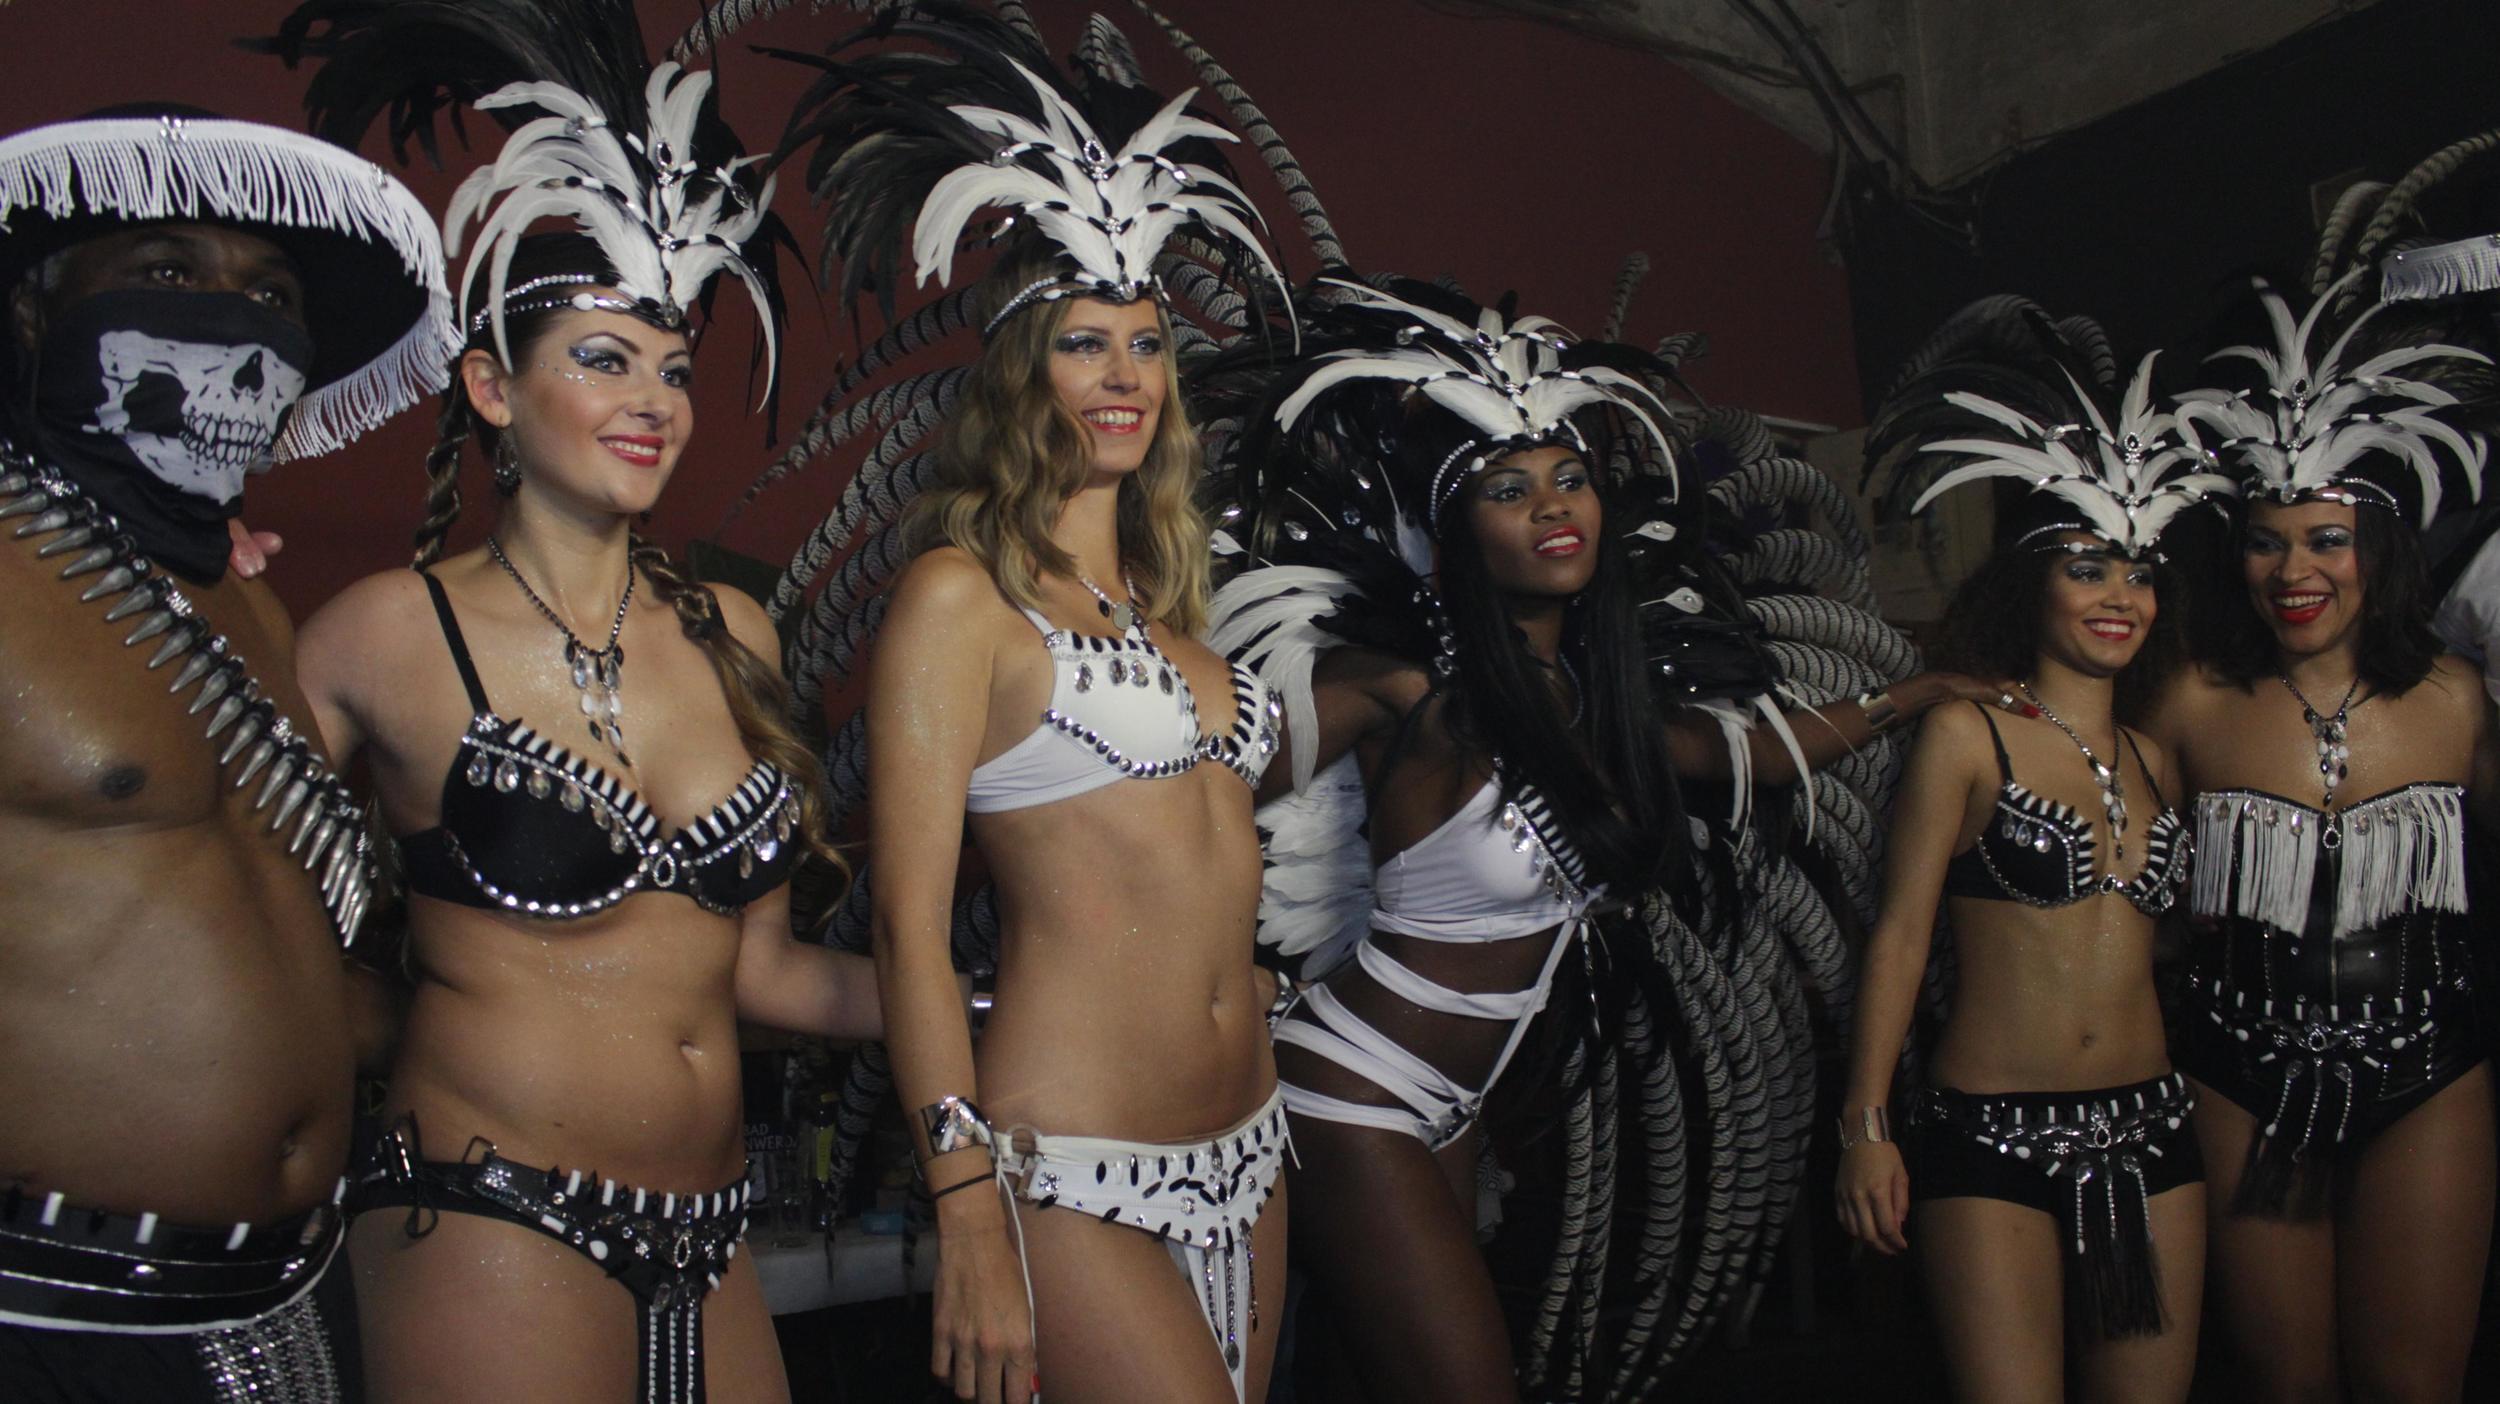 Carnivale Explosion - Jaguar TV all rights